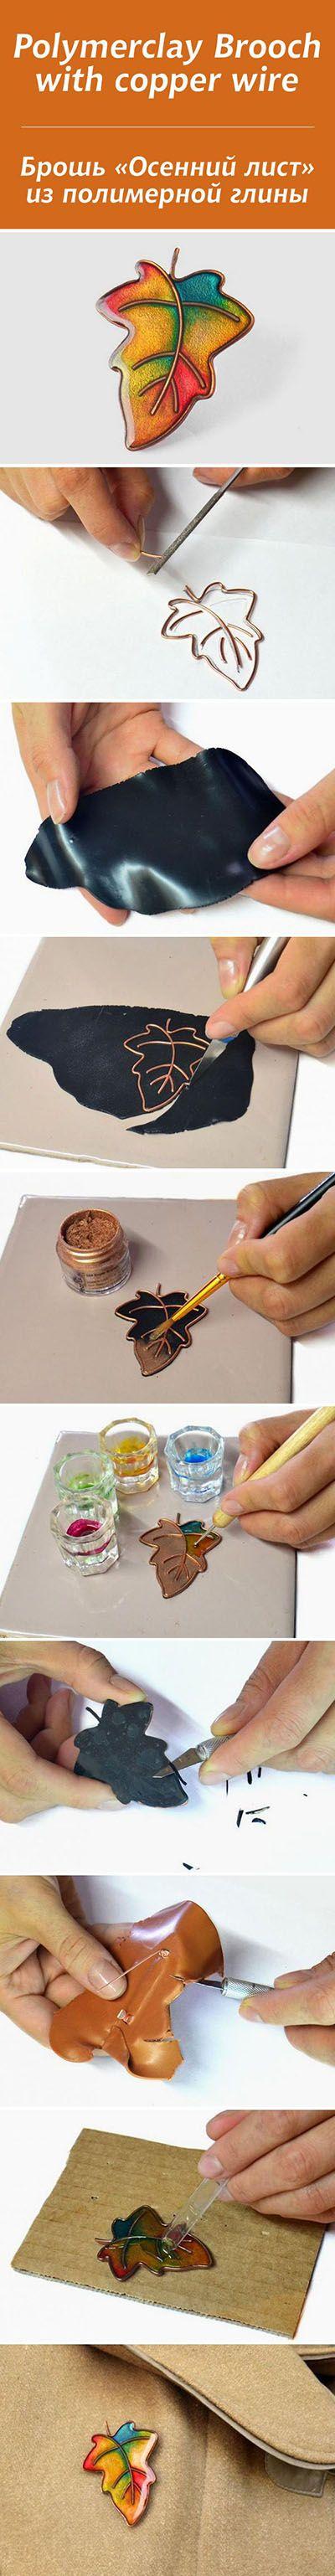 Polymer clay Brooch with copper wire | DIY & Crafts Tutorials